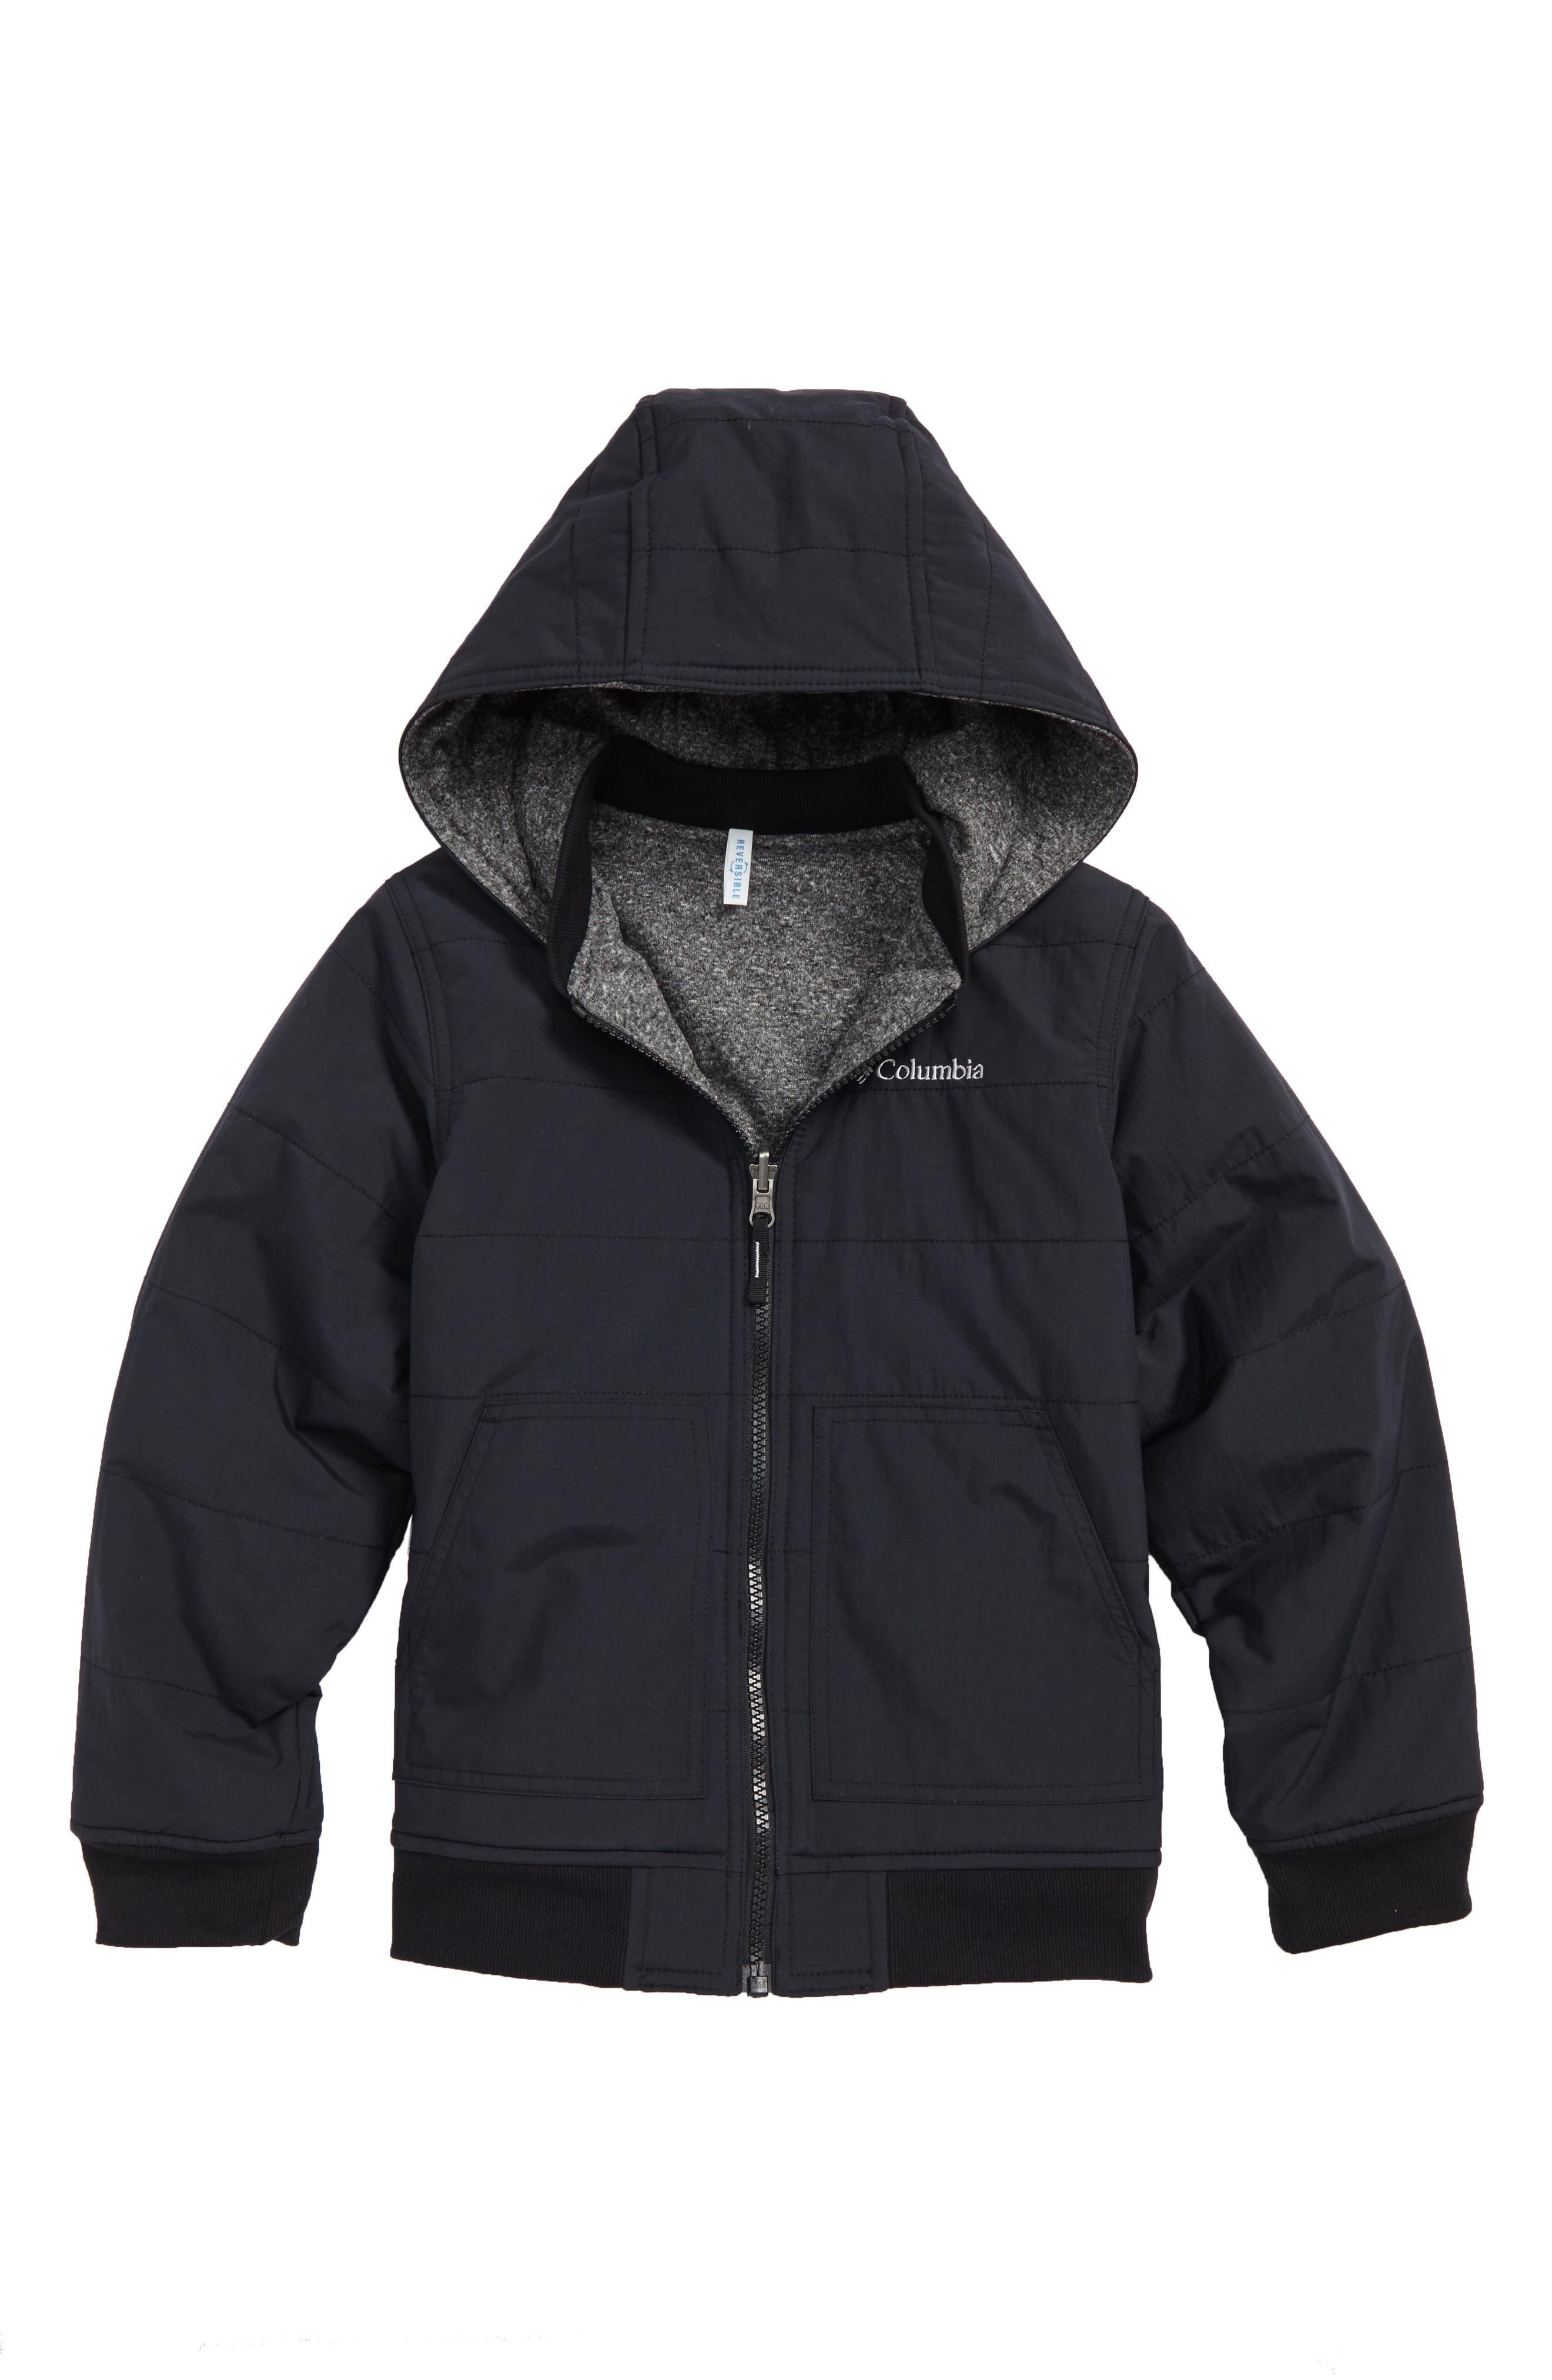 COLUMBIA Evergreen Ridge Reversible Water Resistant Jacket, Main, color, 010